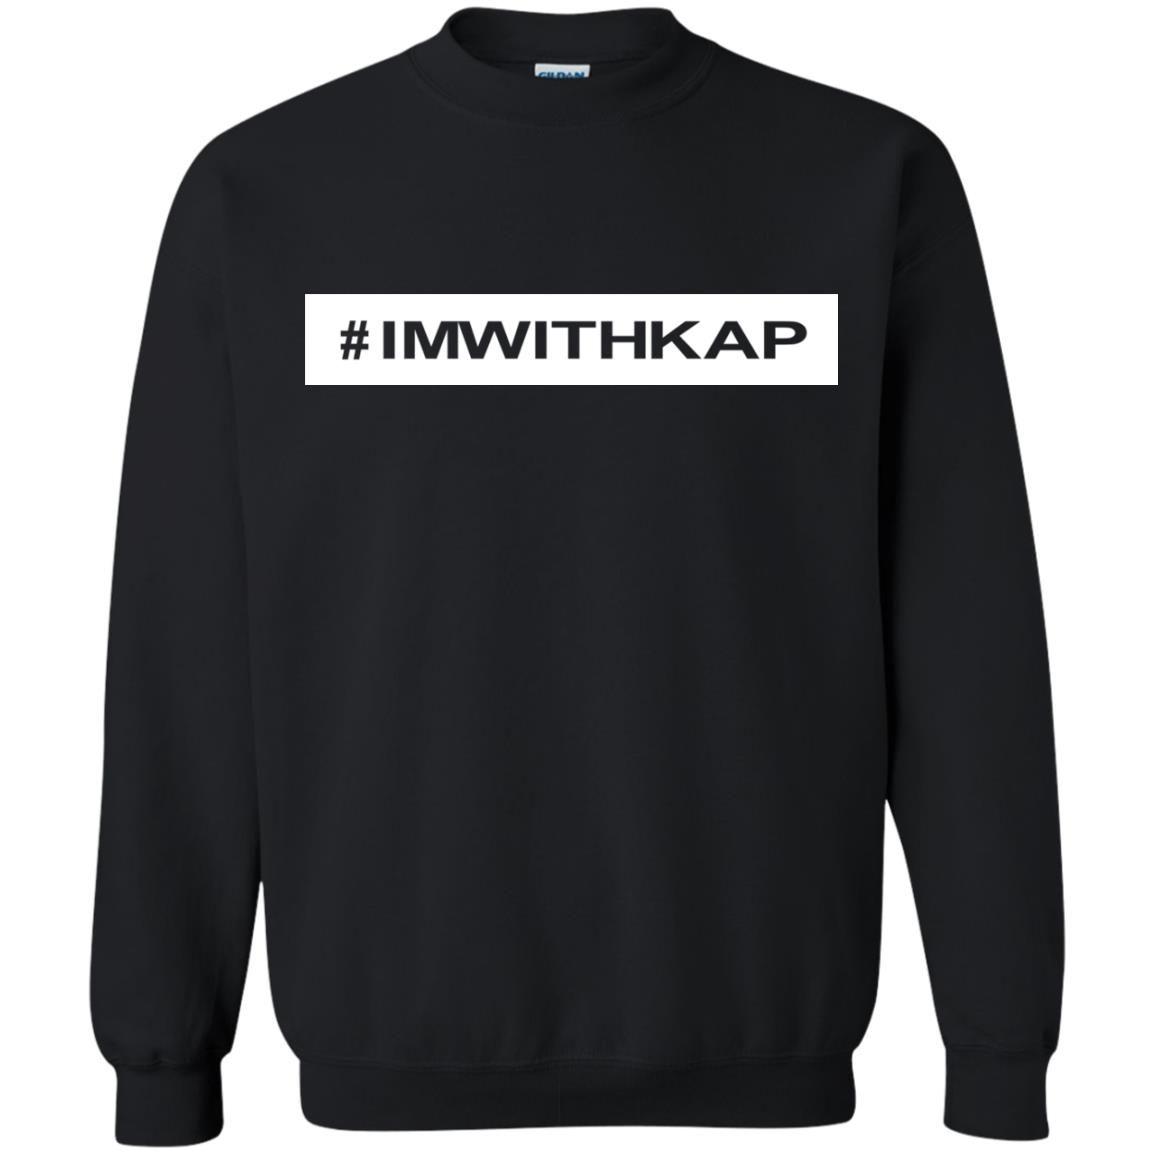 image 1834 - #ImWithKap shirt: I'm with Colin Kaepernick